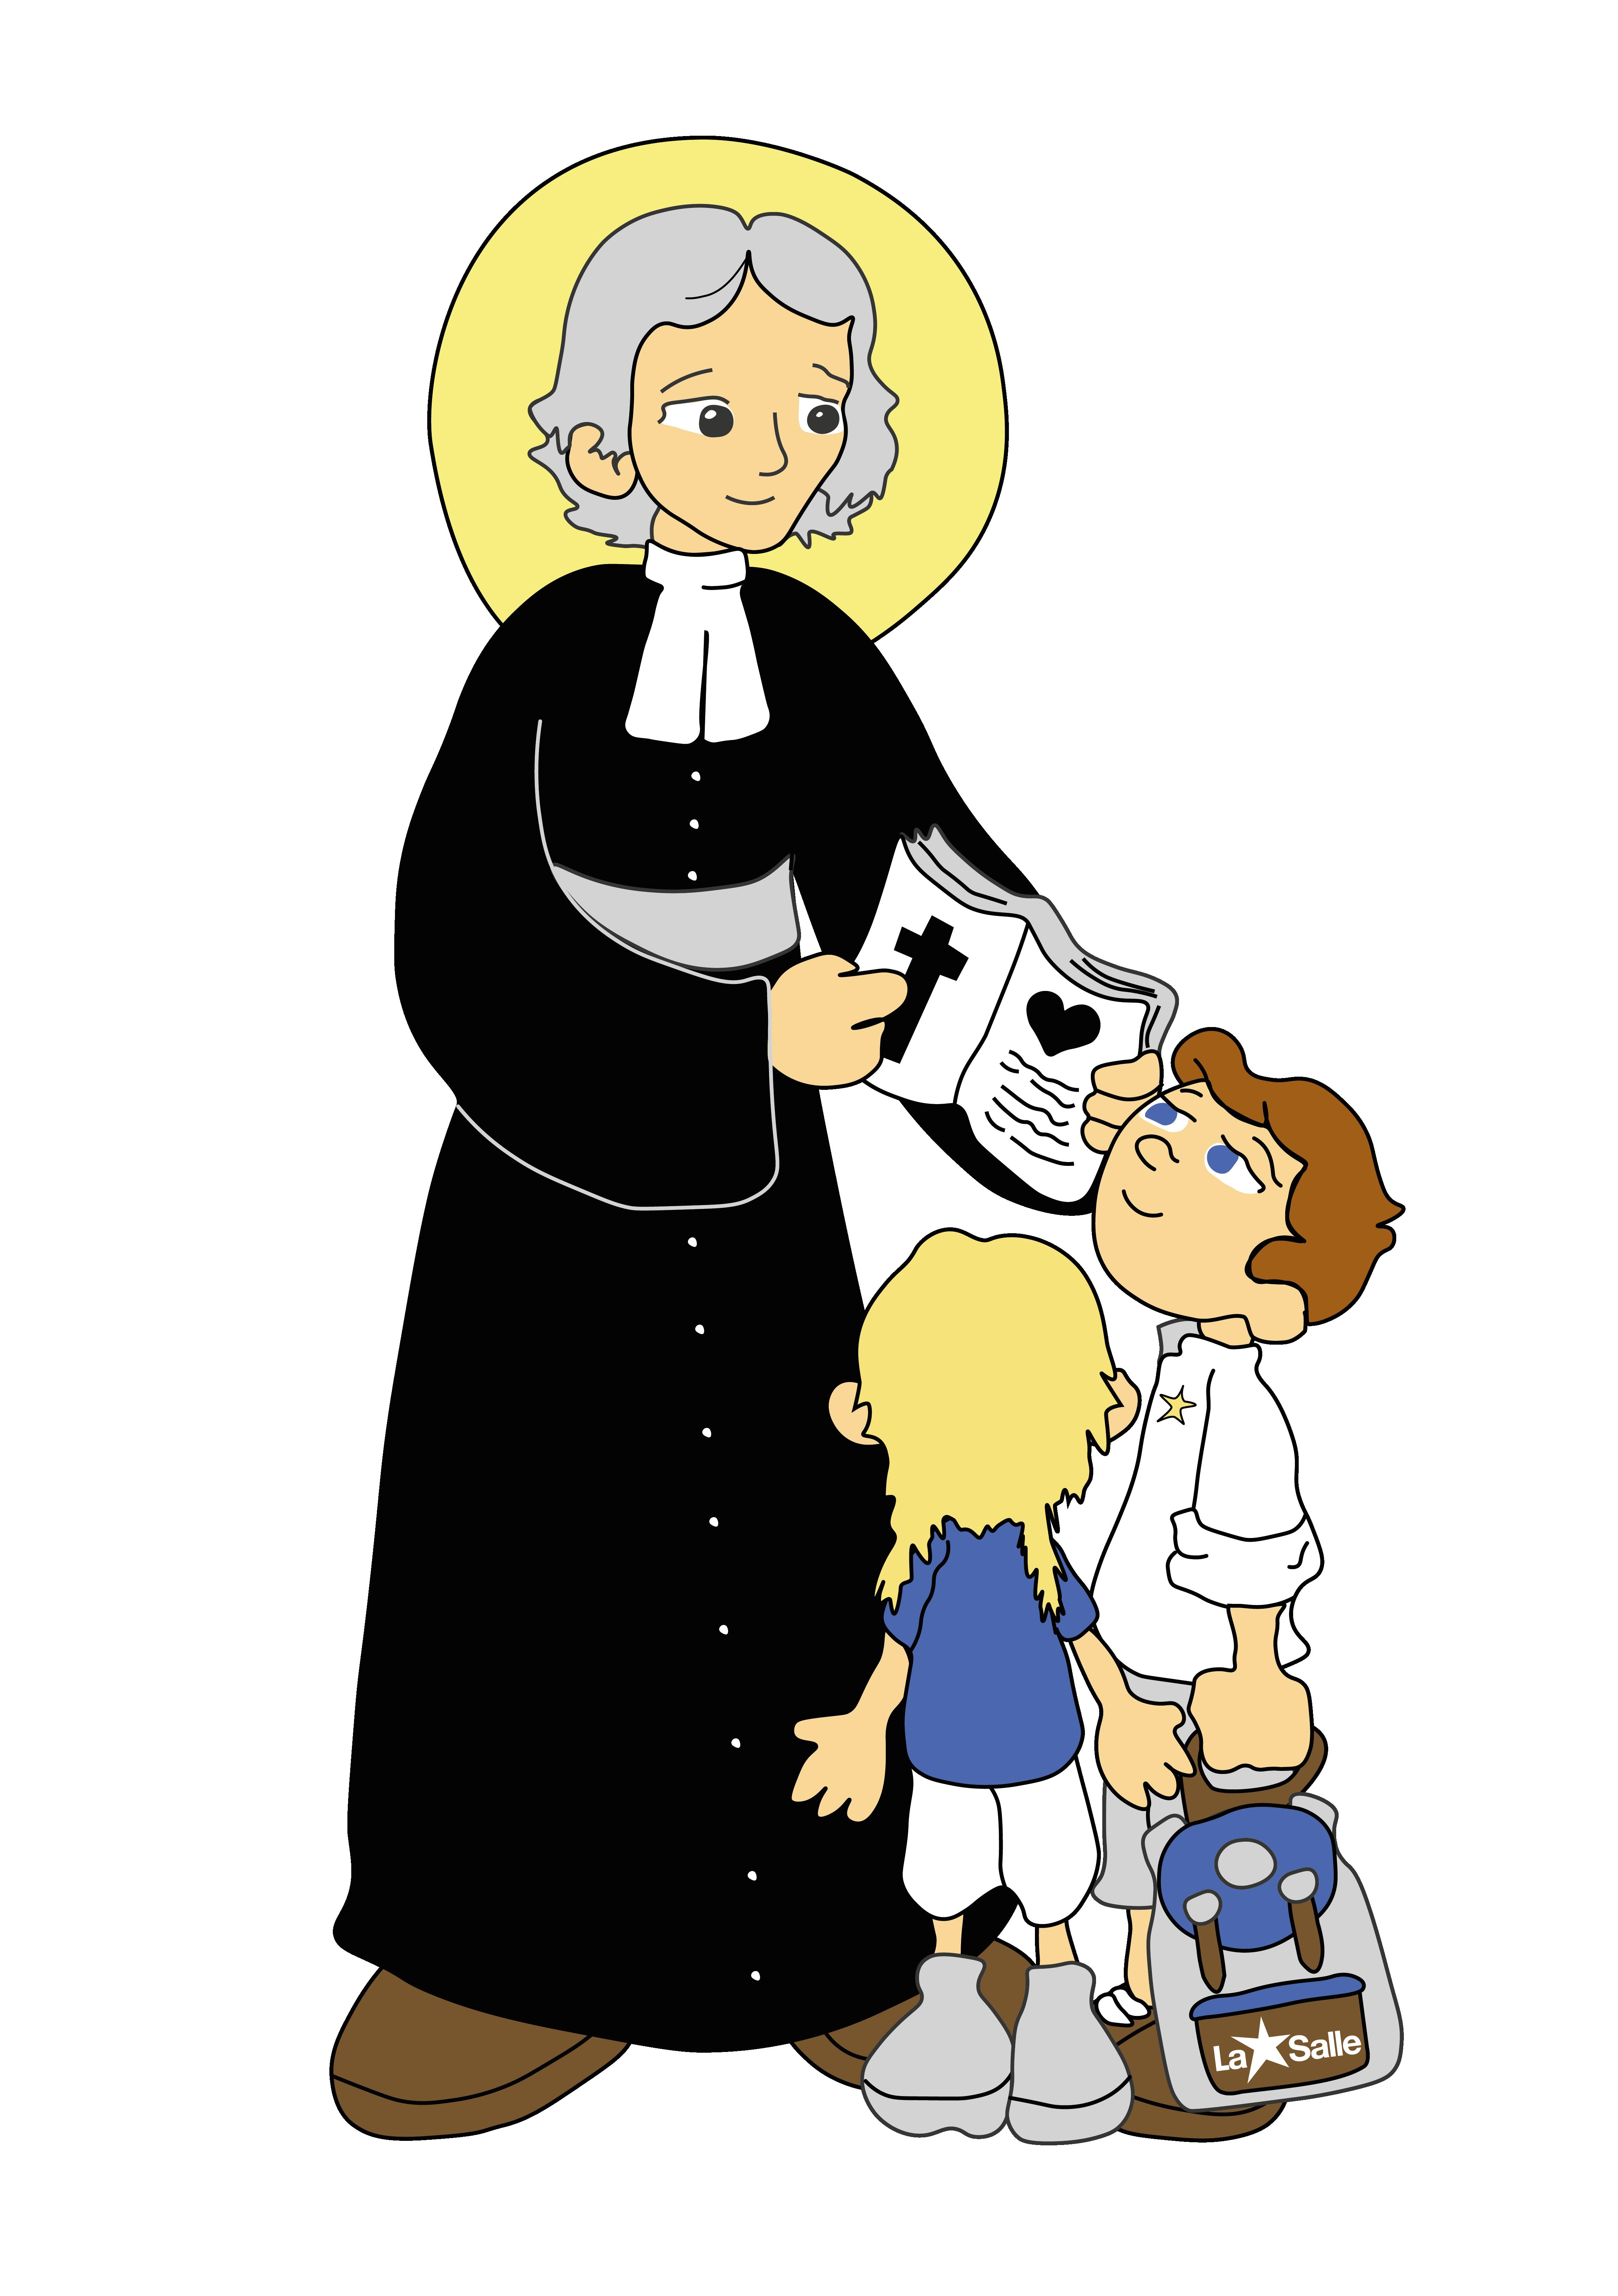 Pastor clipart pious, Pastor pious Transparent FREE for.